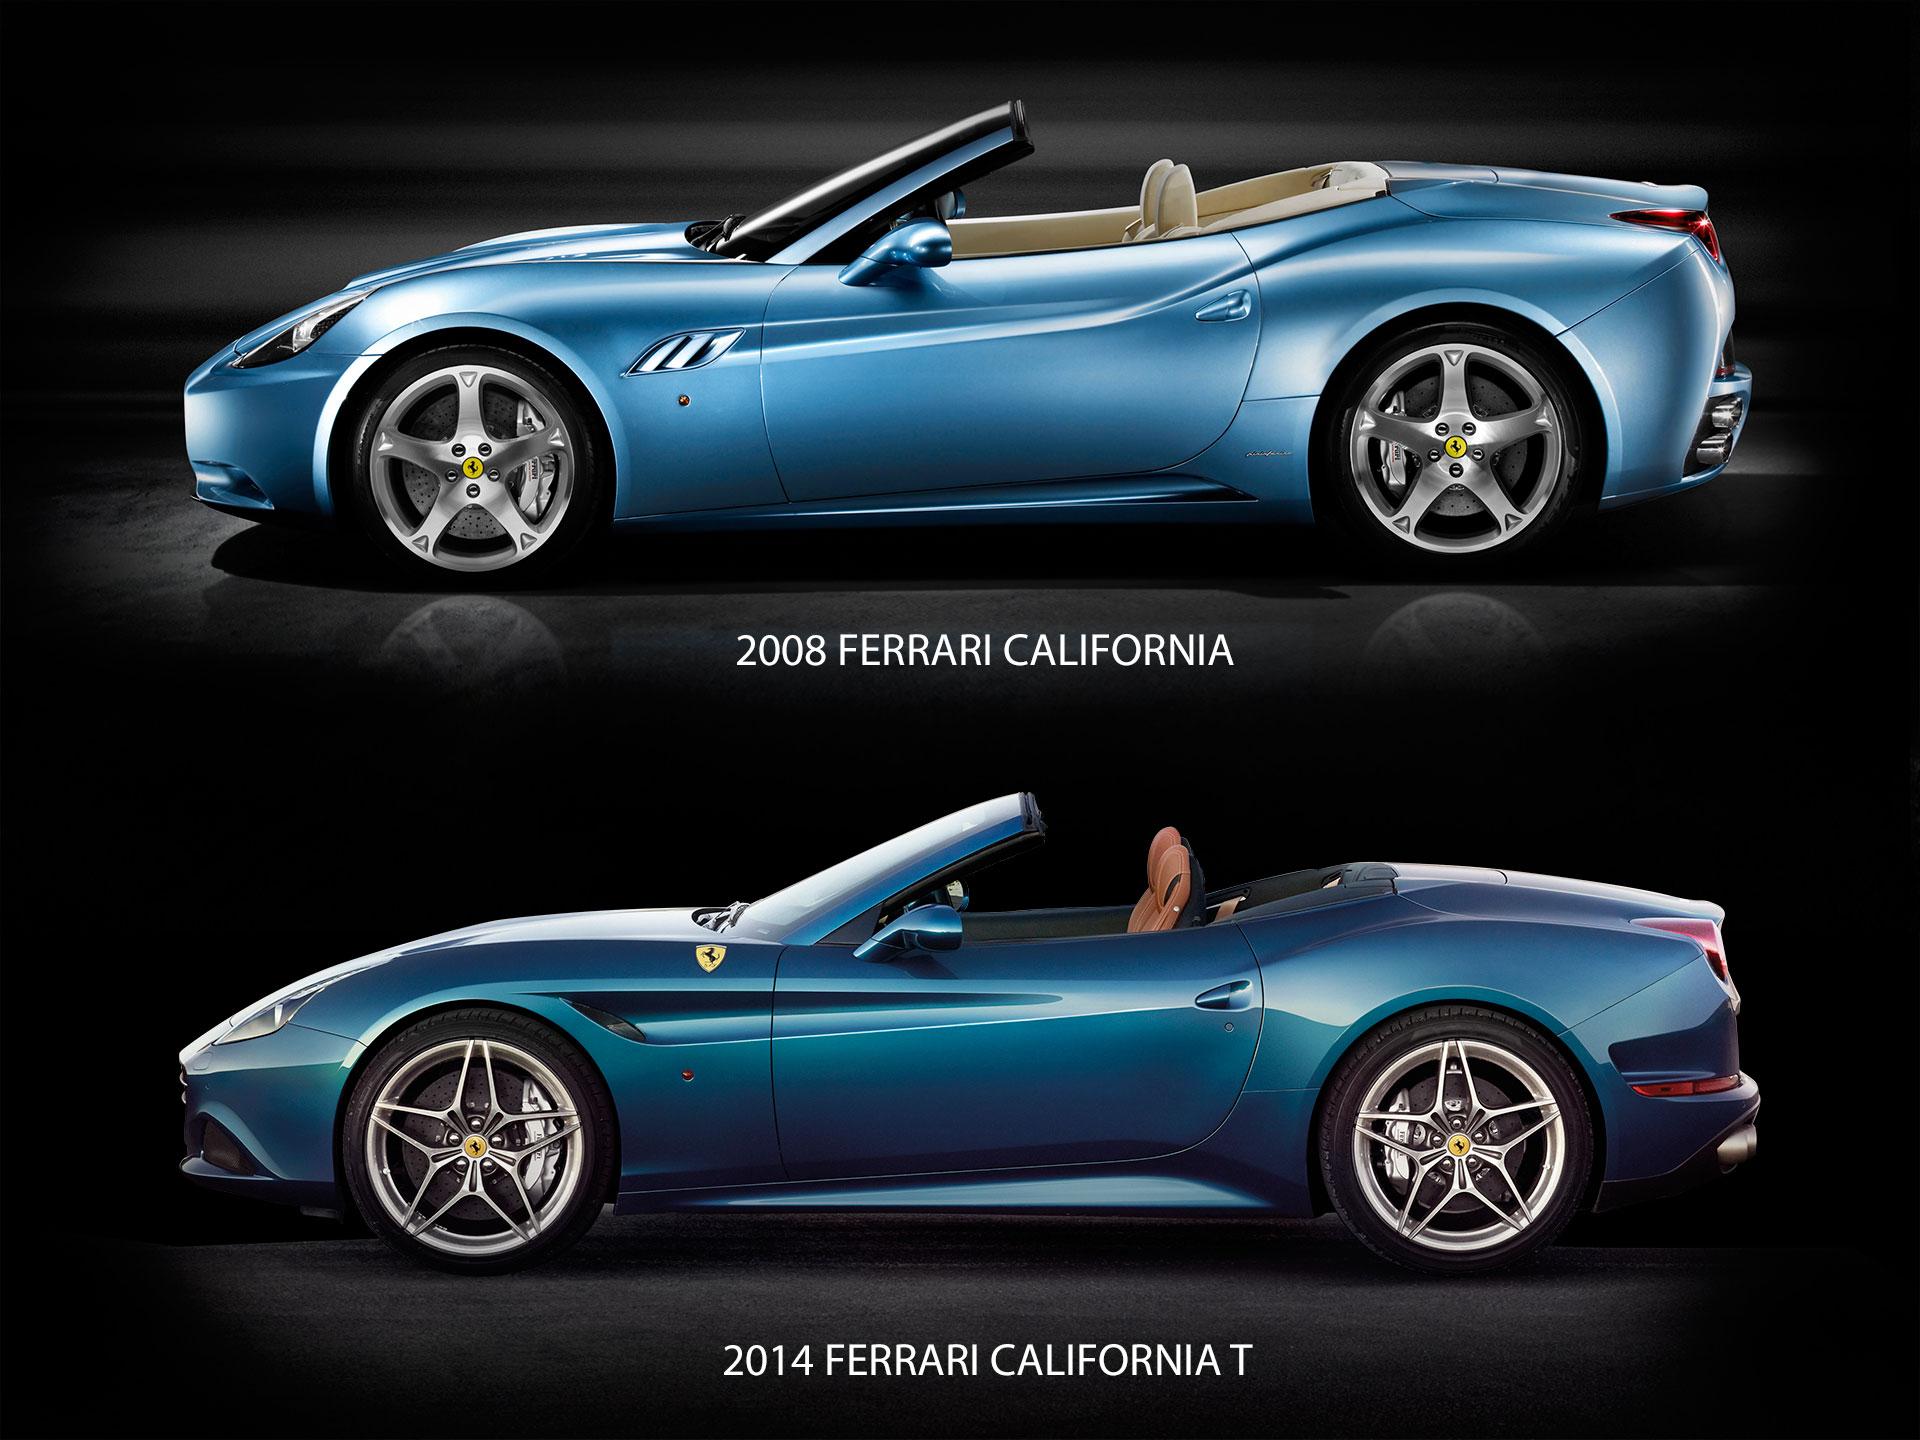 Ferrari Side View Drawings 2008 Ferrari California And